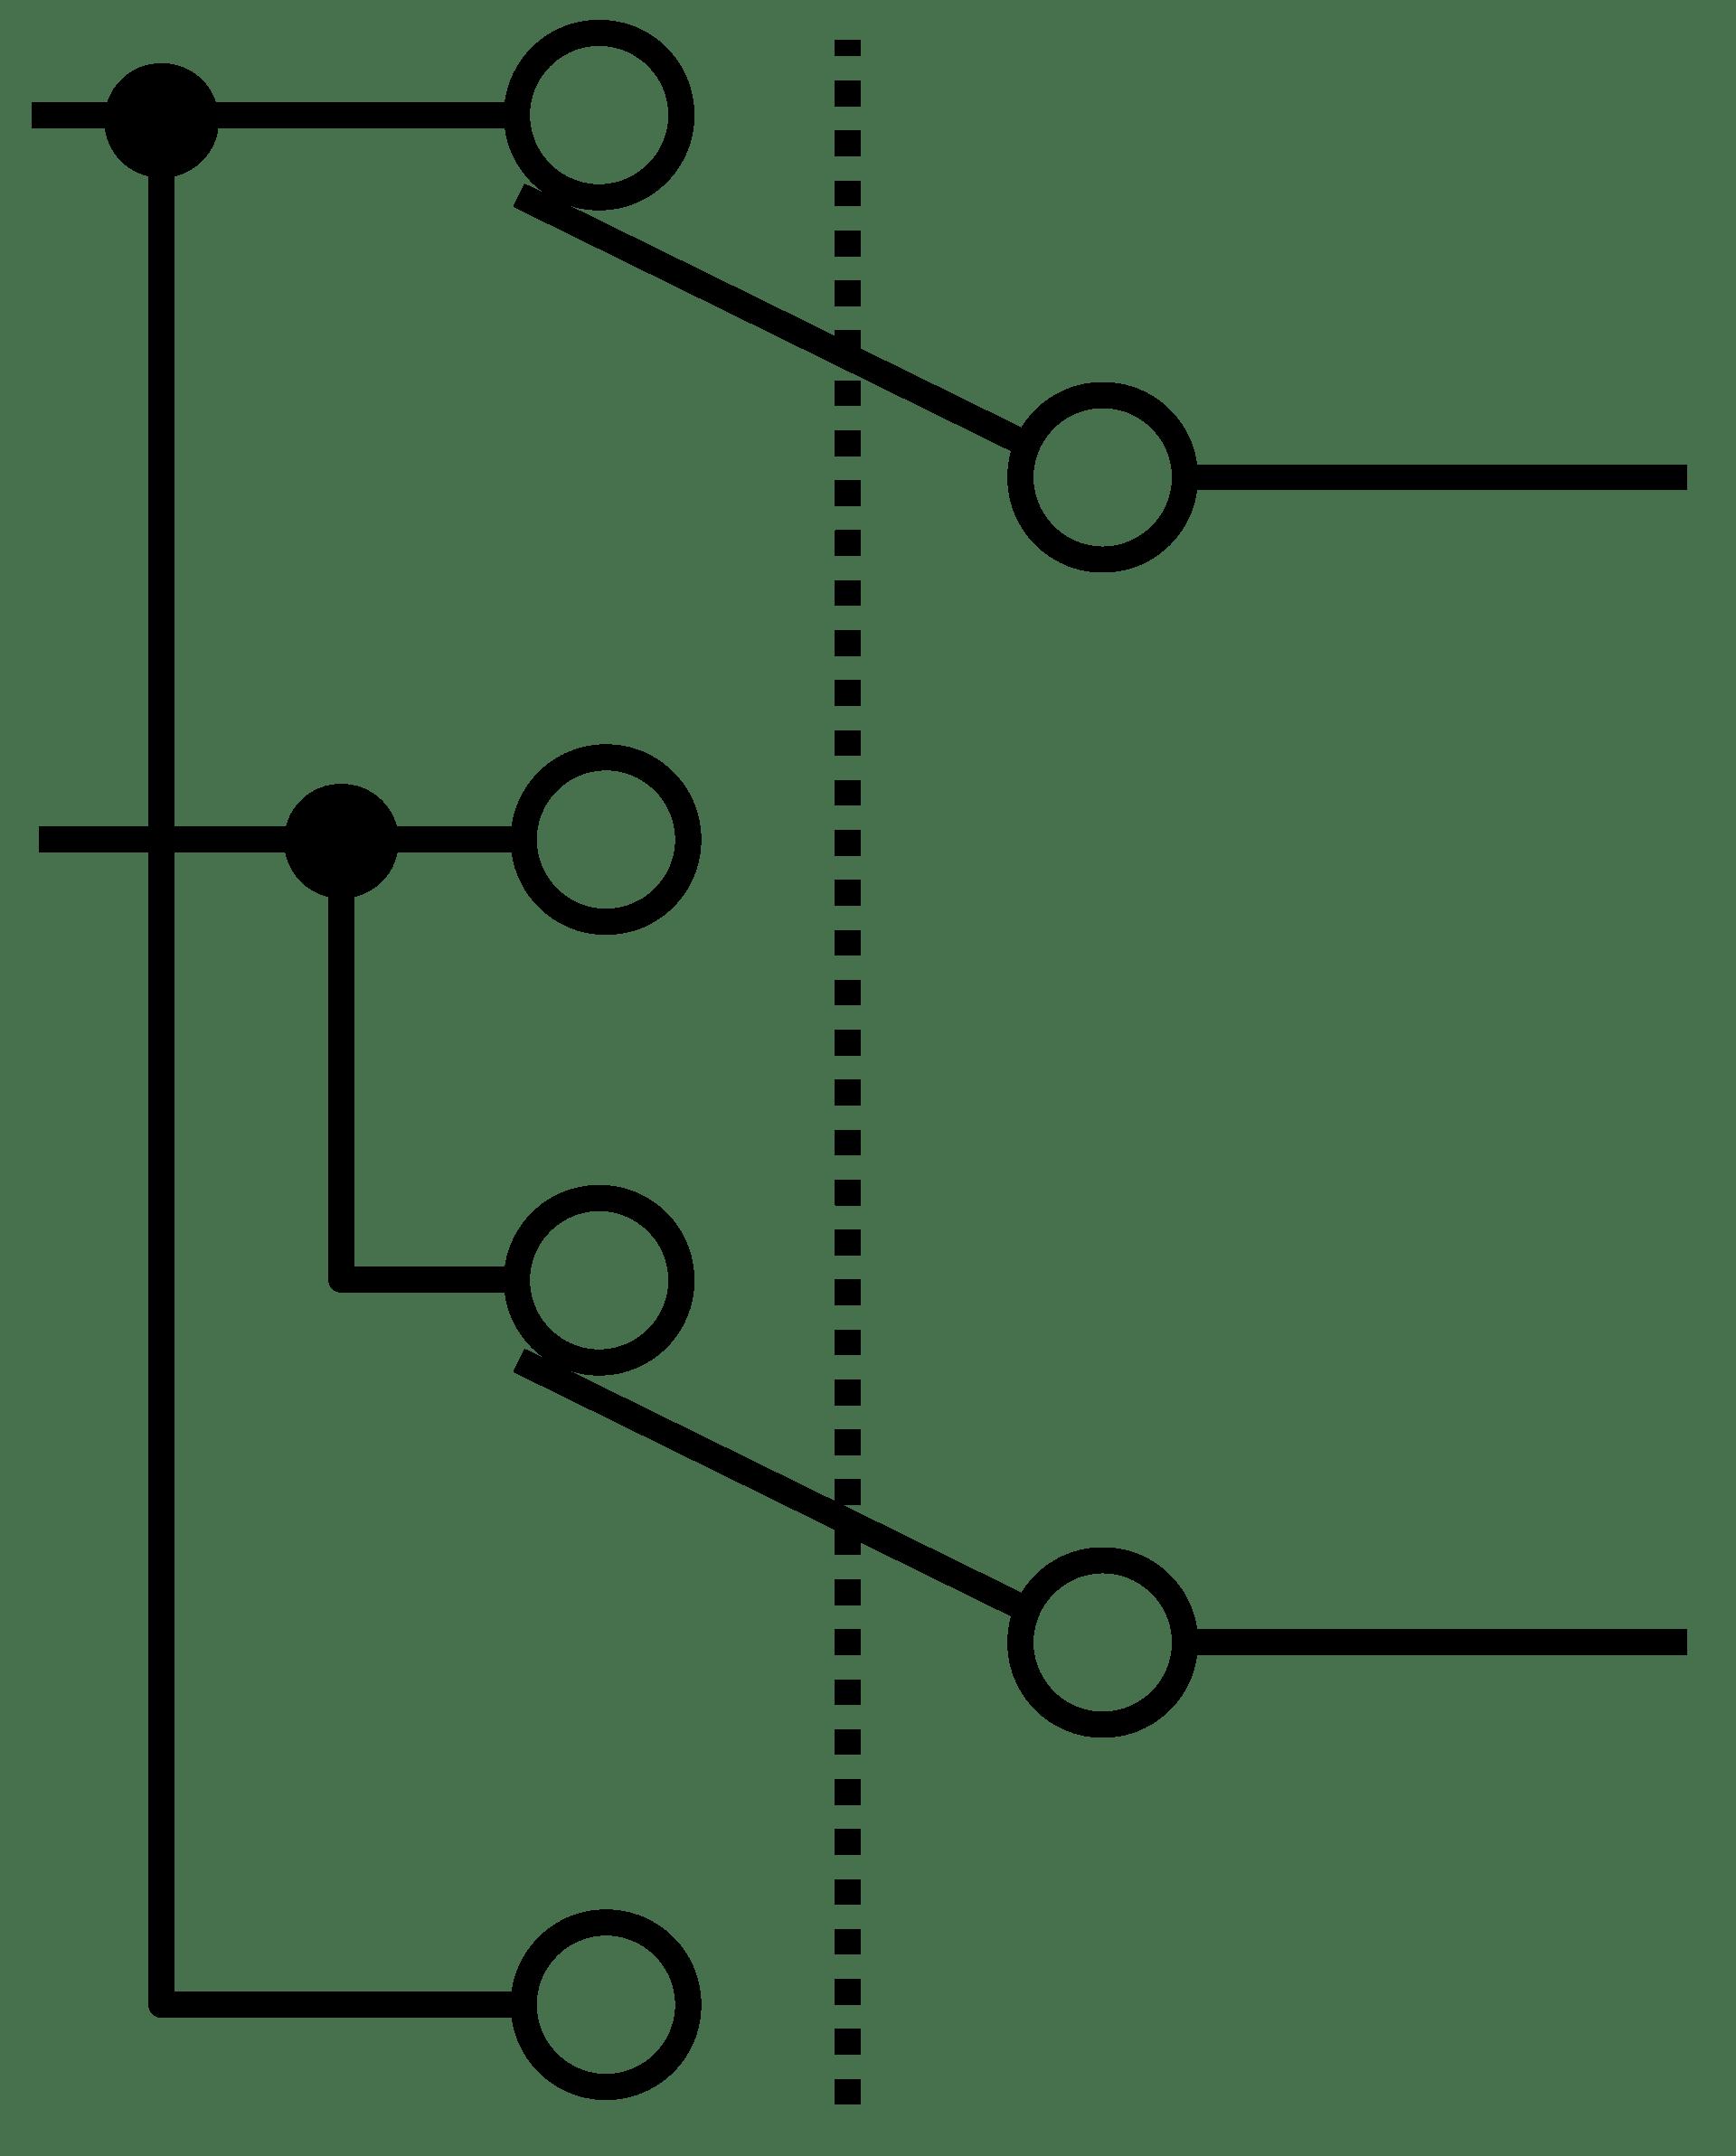 Brilliant One Way Switch Symbol Auto Electrical Wiring Diagram Wiring Cloud Rometaidewilluminateatxorg